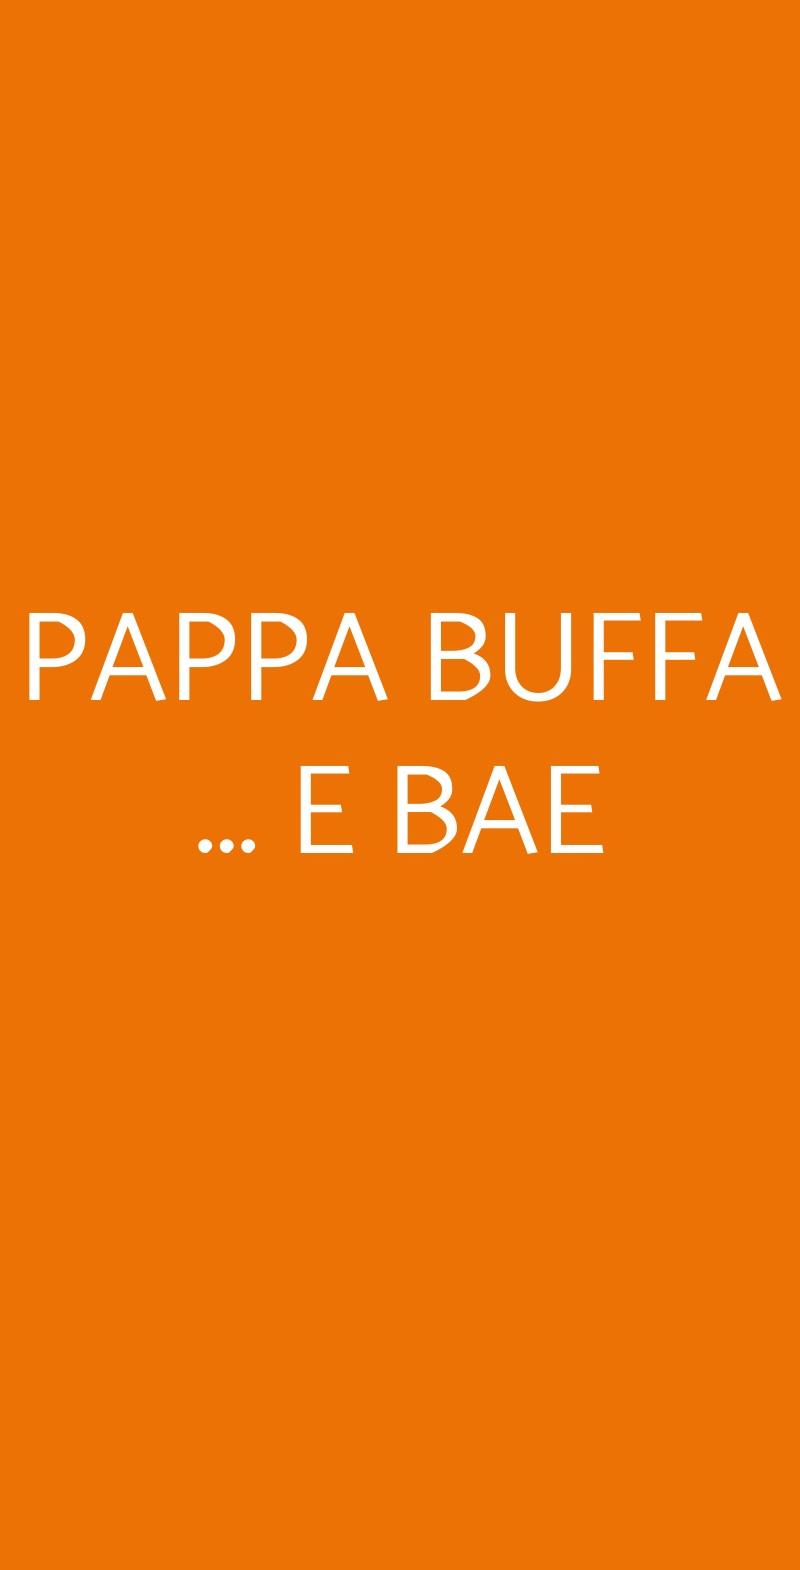 PAPPA BUFFA ... E BAE Calasetta menù 1 pagina